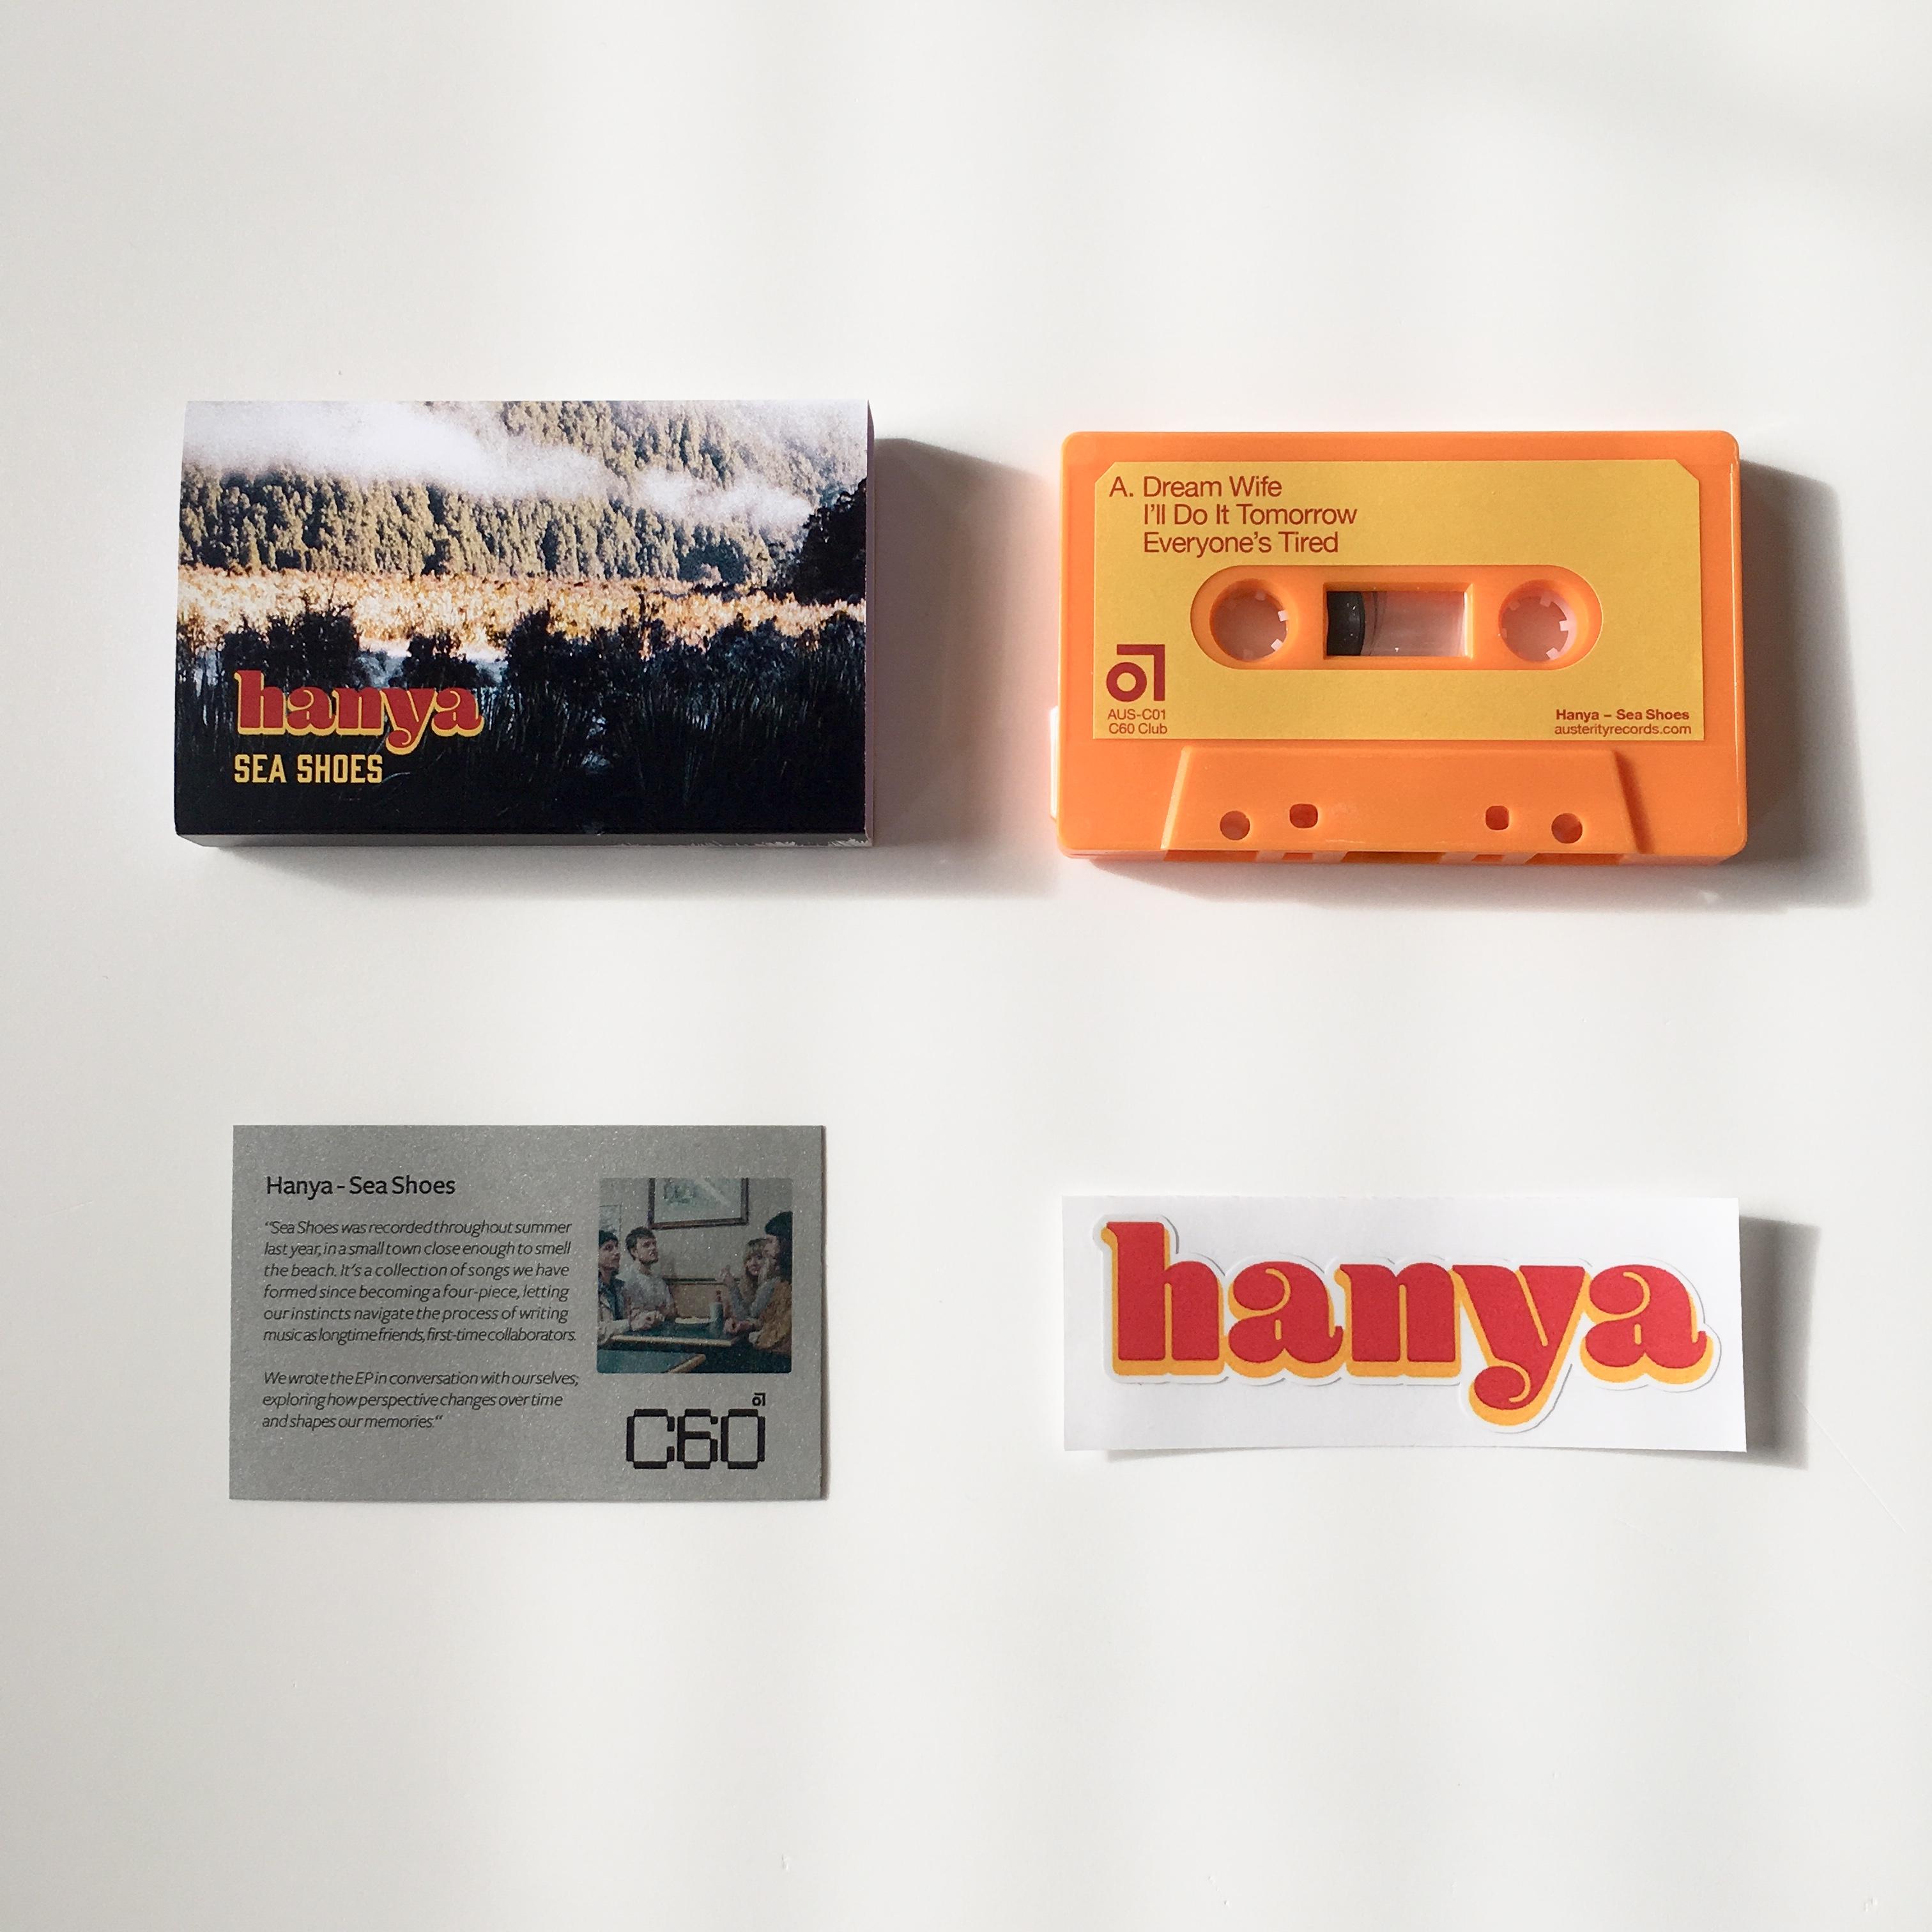 Hanya - Sea Shoes (Very limited orange cassette)